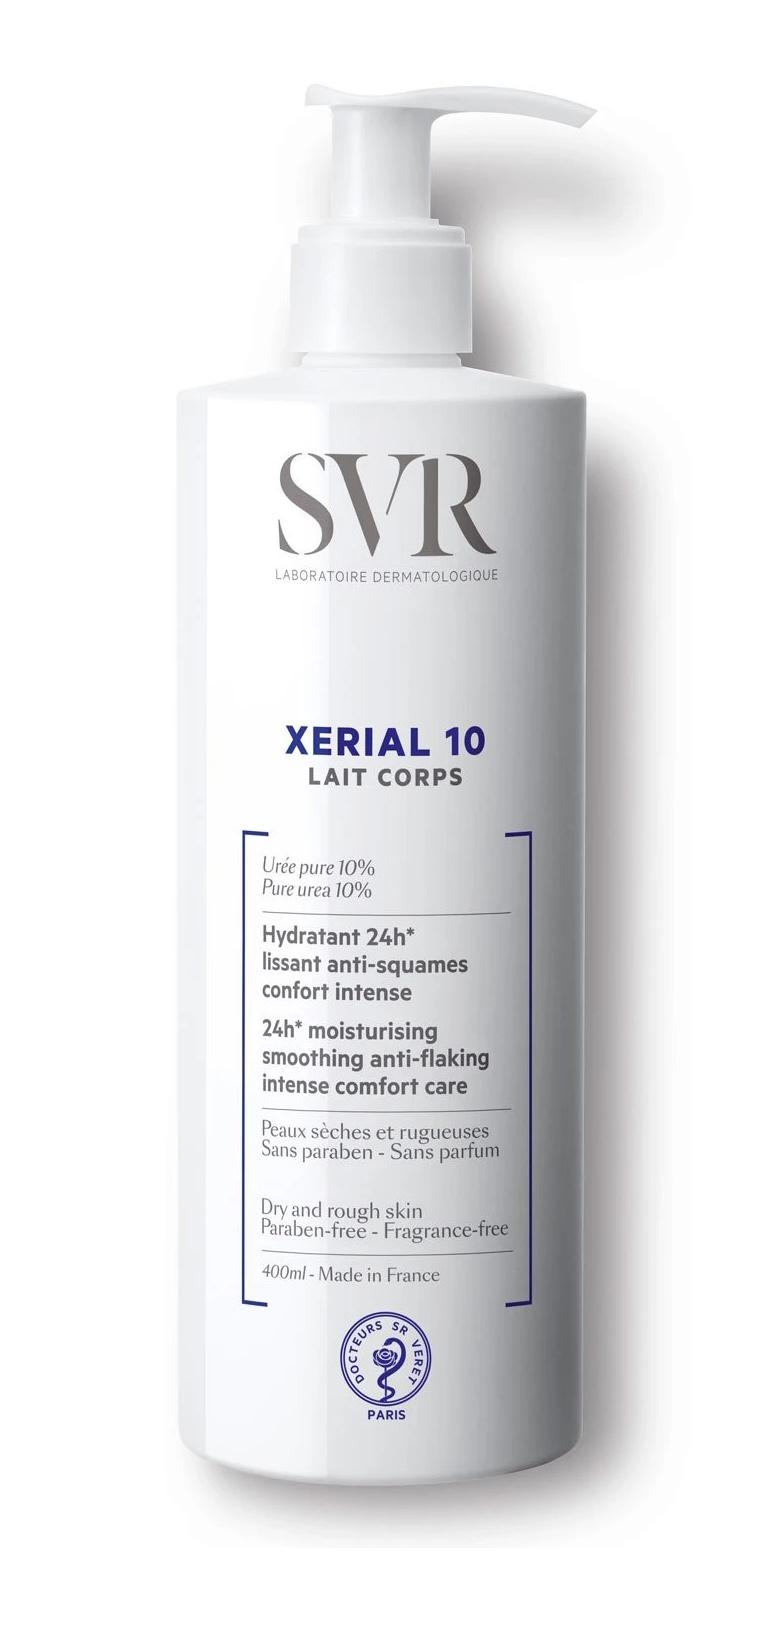 SVR Xerial 10 Lait Corps